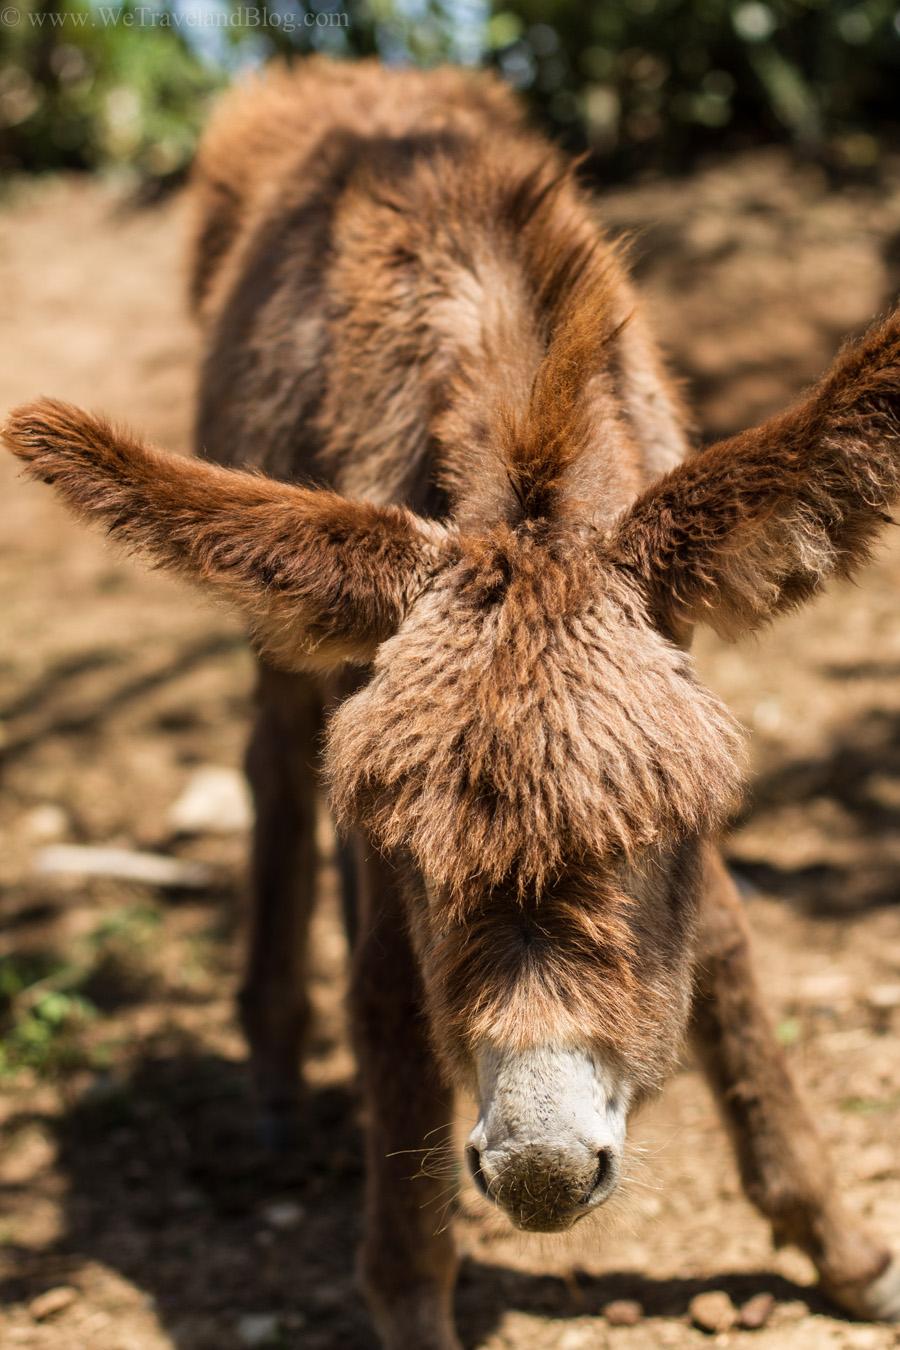 donkey, baby donkey, baby animal, adorable, cute, adorable, http://wetravelandblog.com